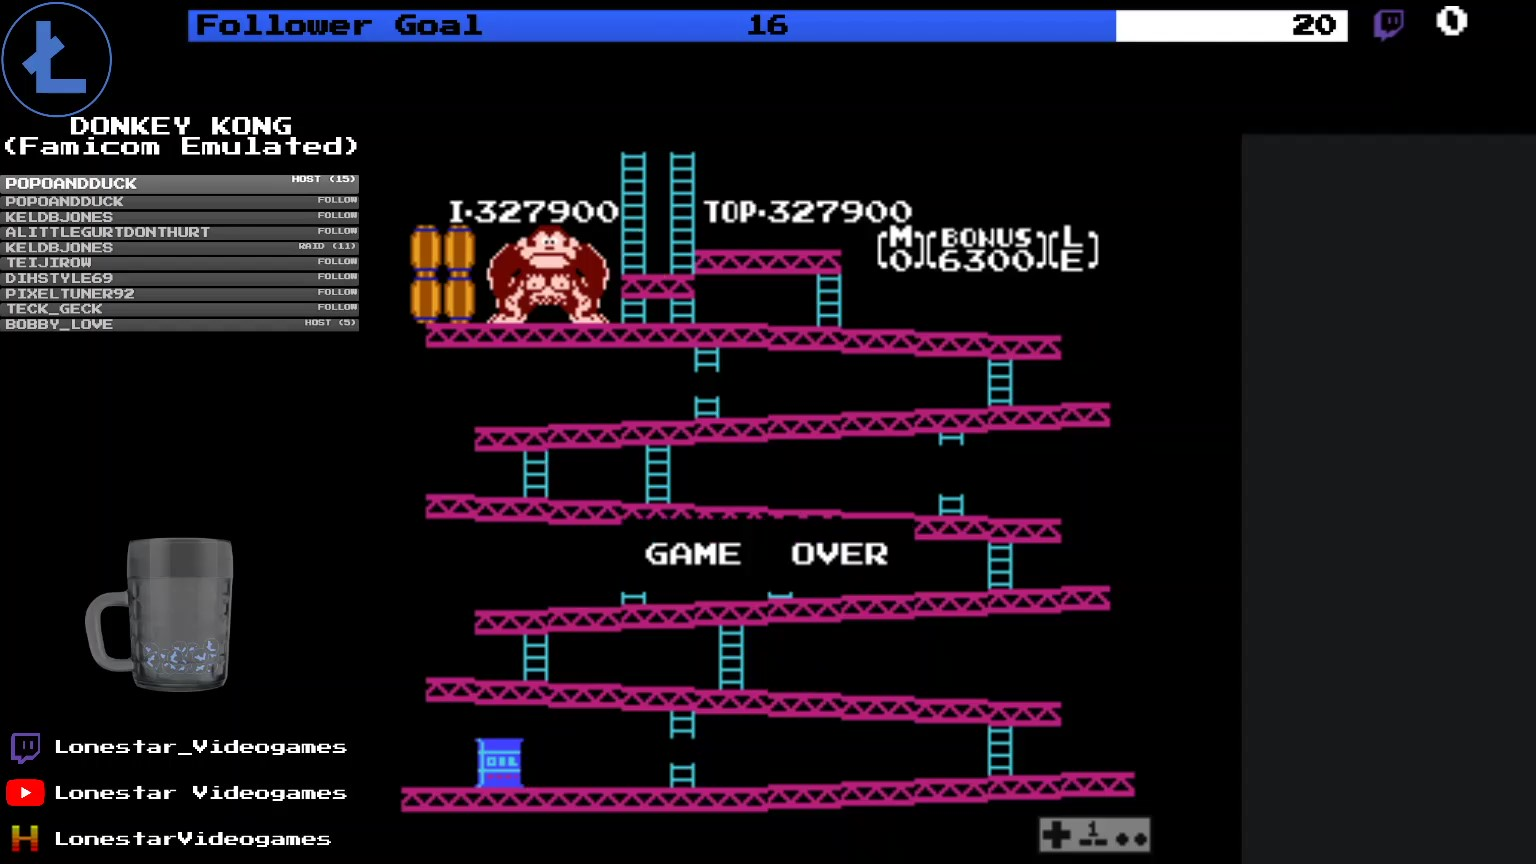 LonestarVideogames: Donkey Kong (NES/Famicom Emulated) 327,900 points on 2020-04-03 19:52:42